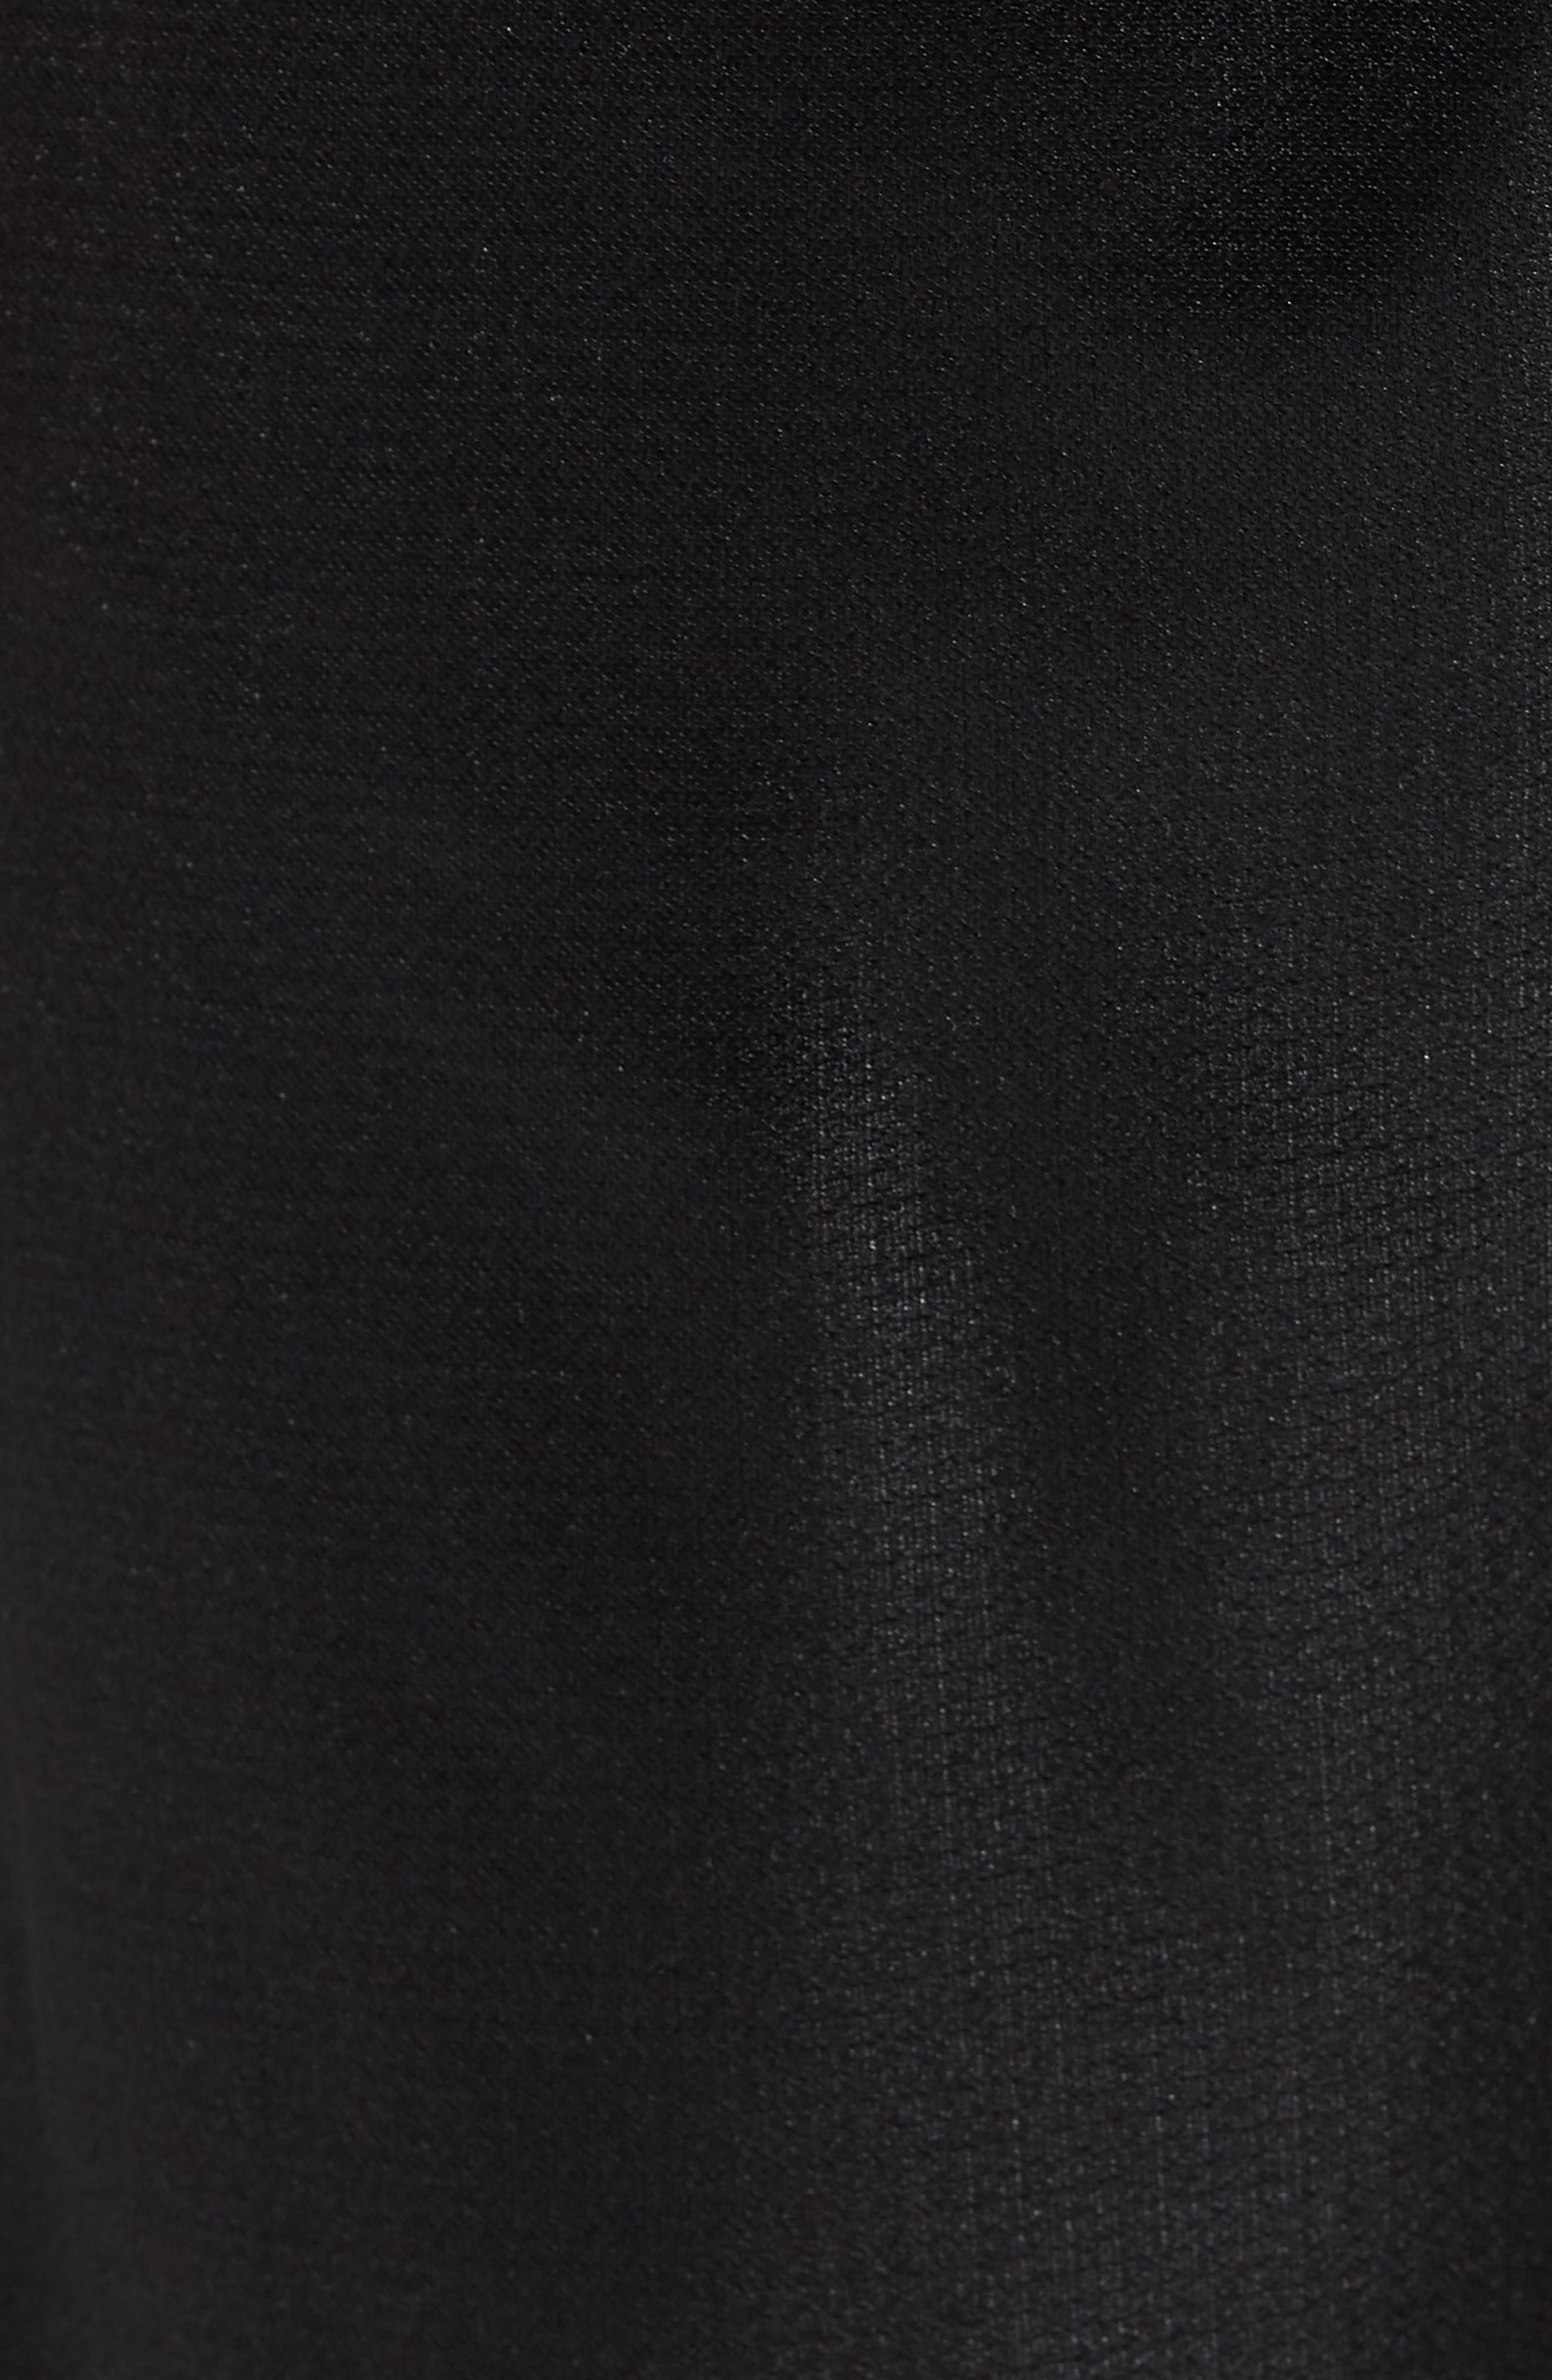 NSW Archive Shorts,                             Alternate thumbnail 5, color,                             BLACK/ SAIL/ SAIL